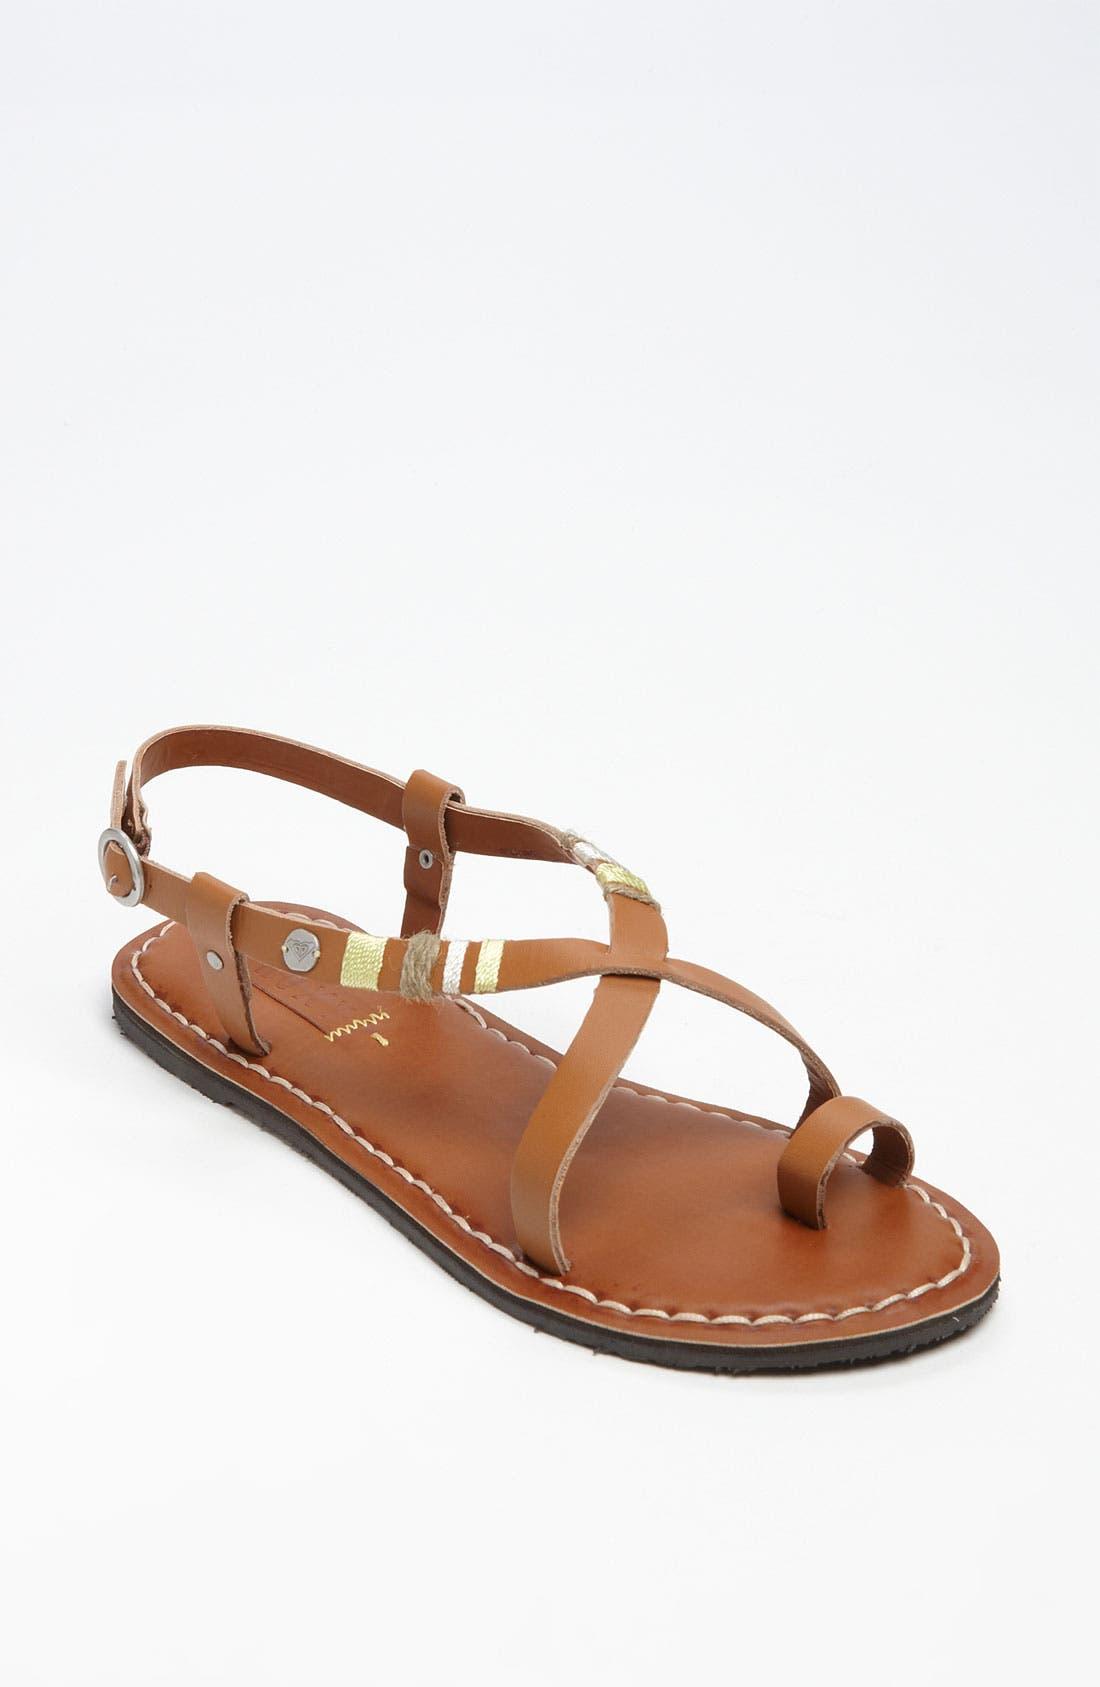 Main Image - Roxy 'Mojito' Sandal